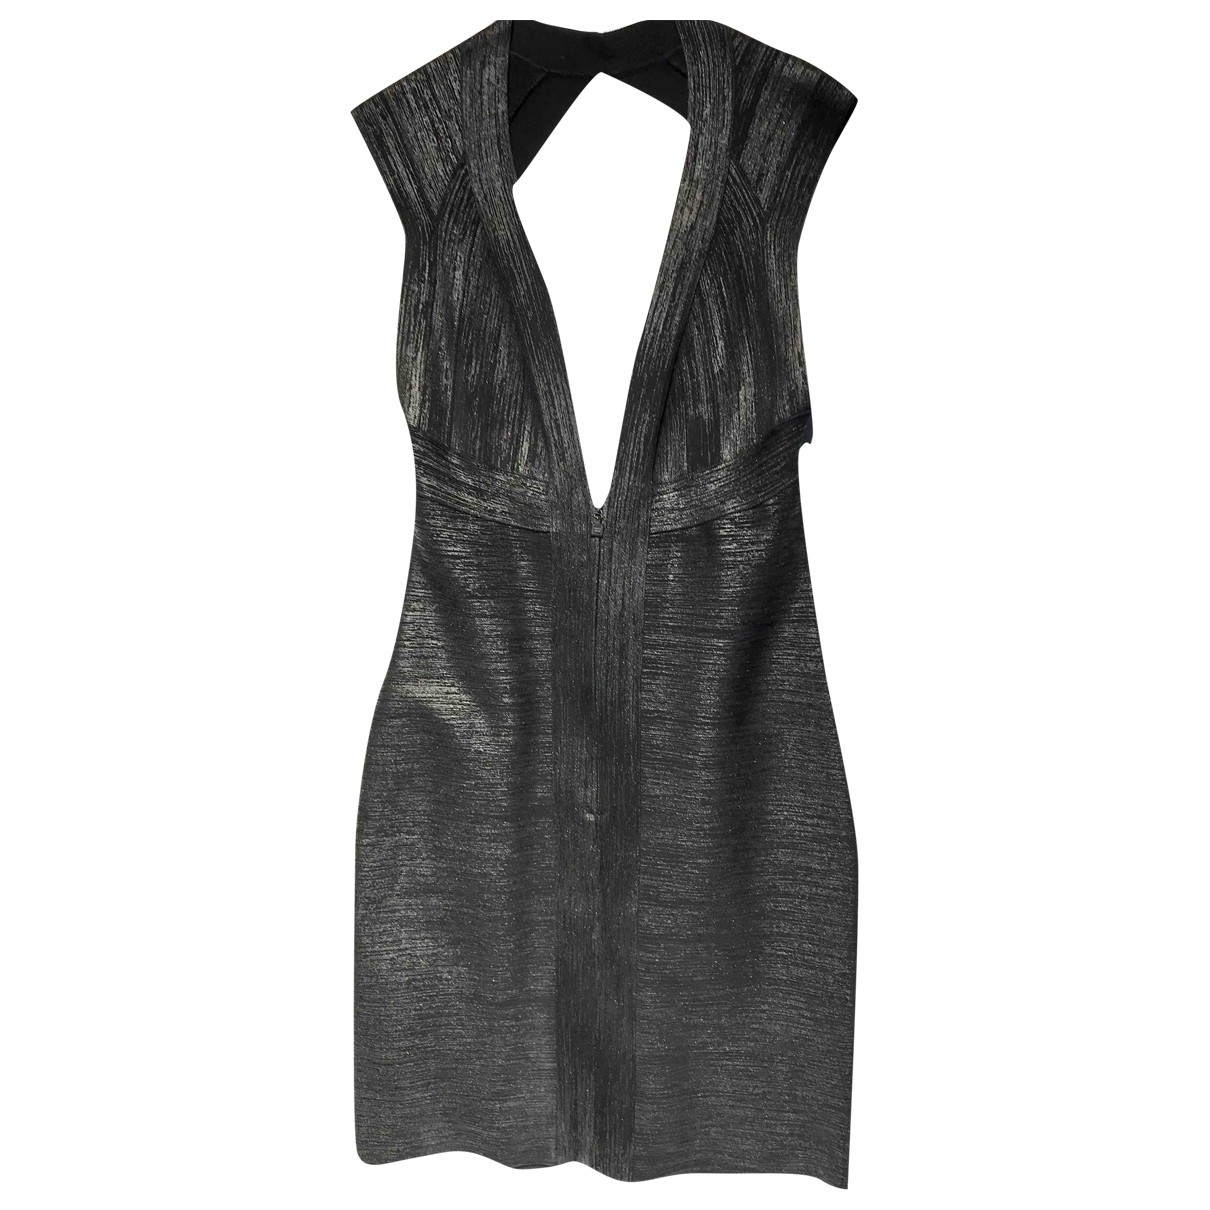 Herve Leger \N Black dress for Women L International